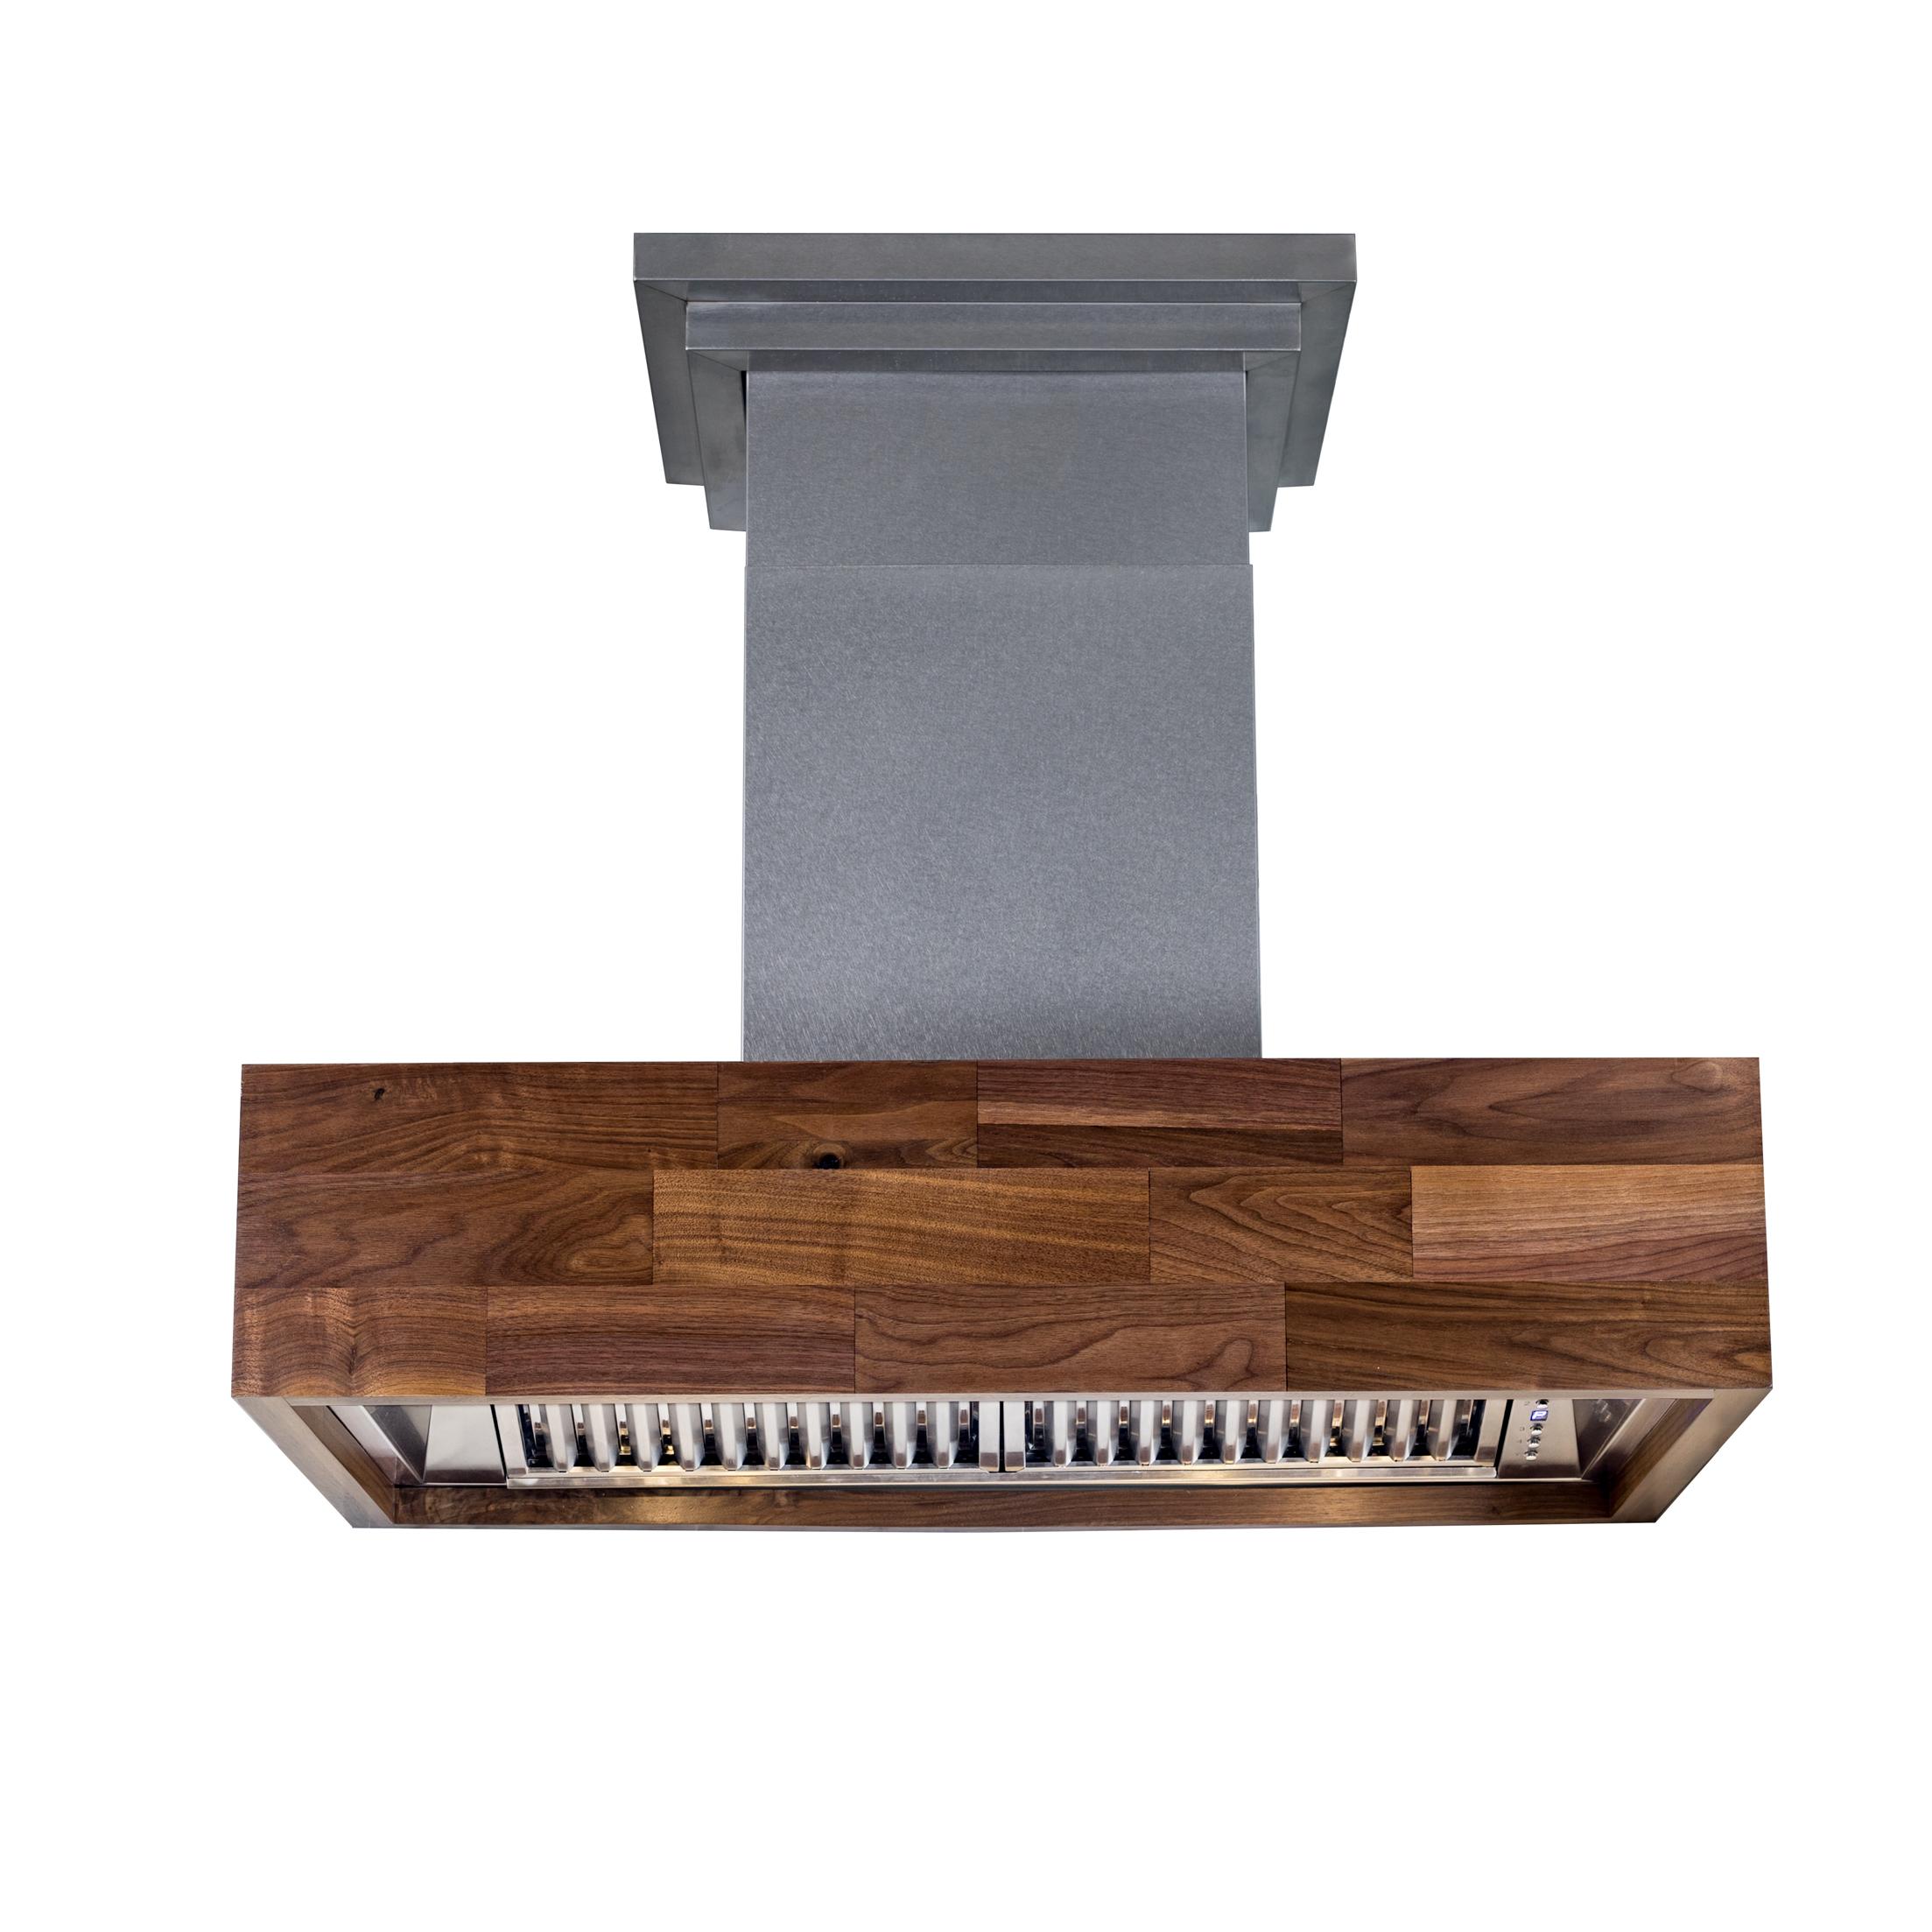 zline-designer-wood-range-hood-681W-main.jpg